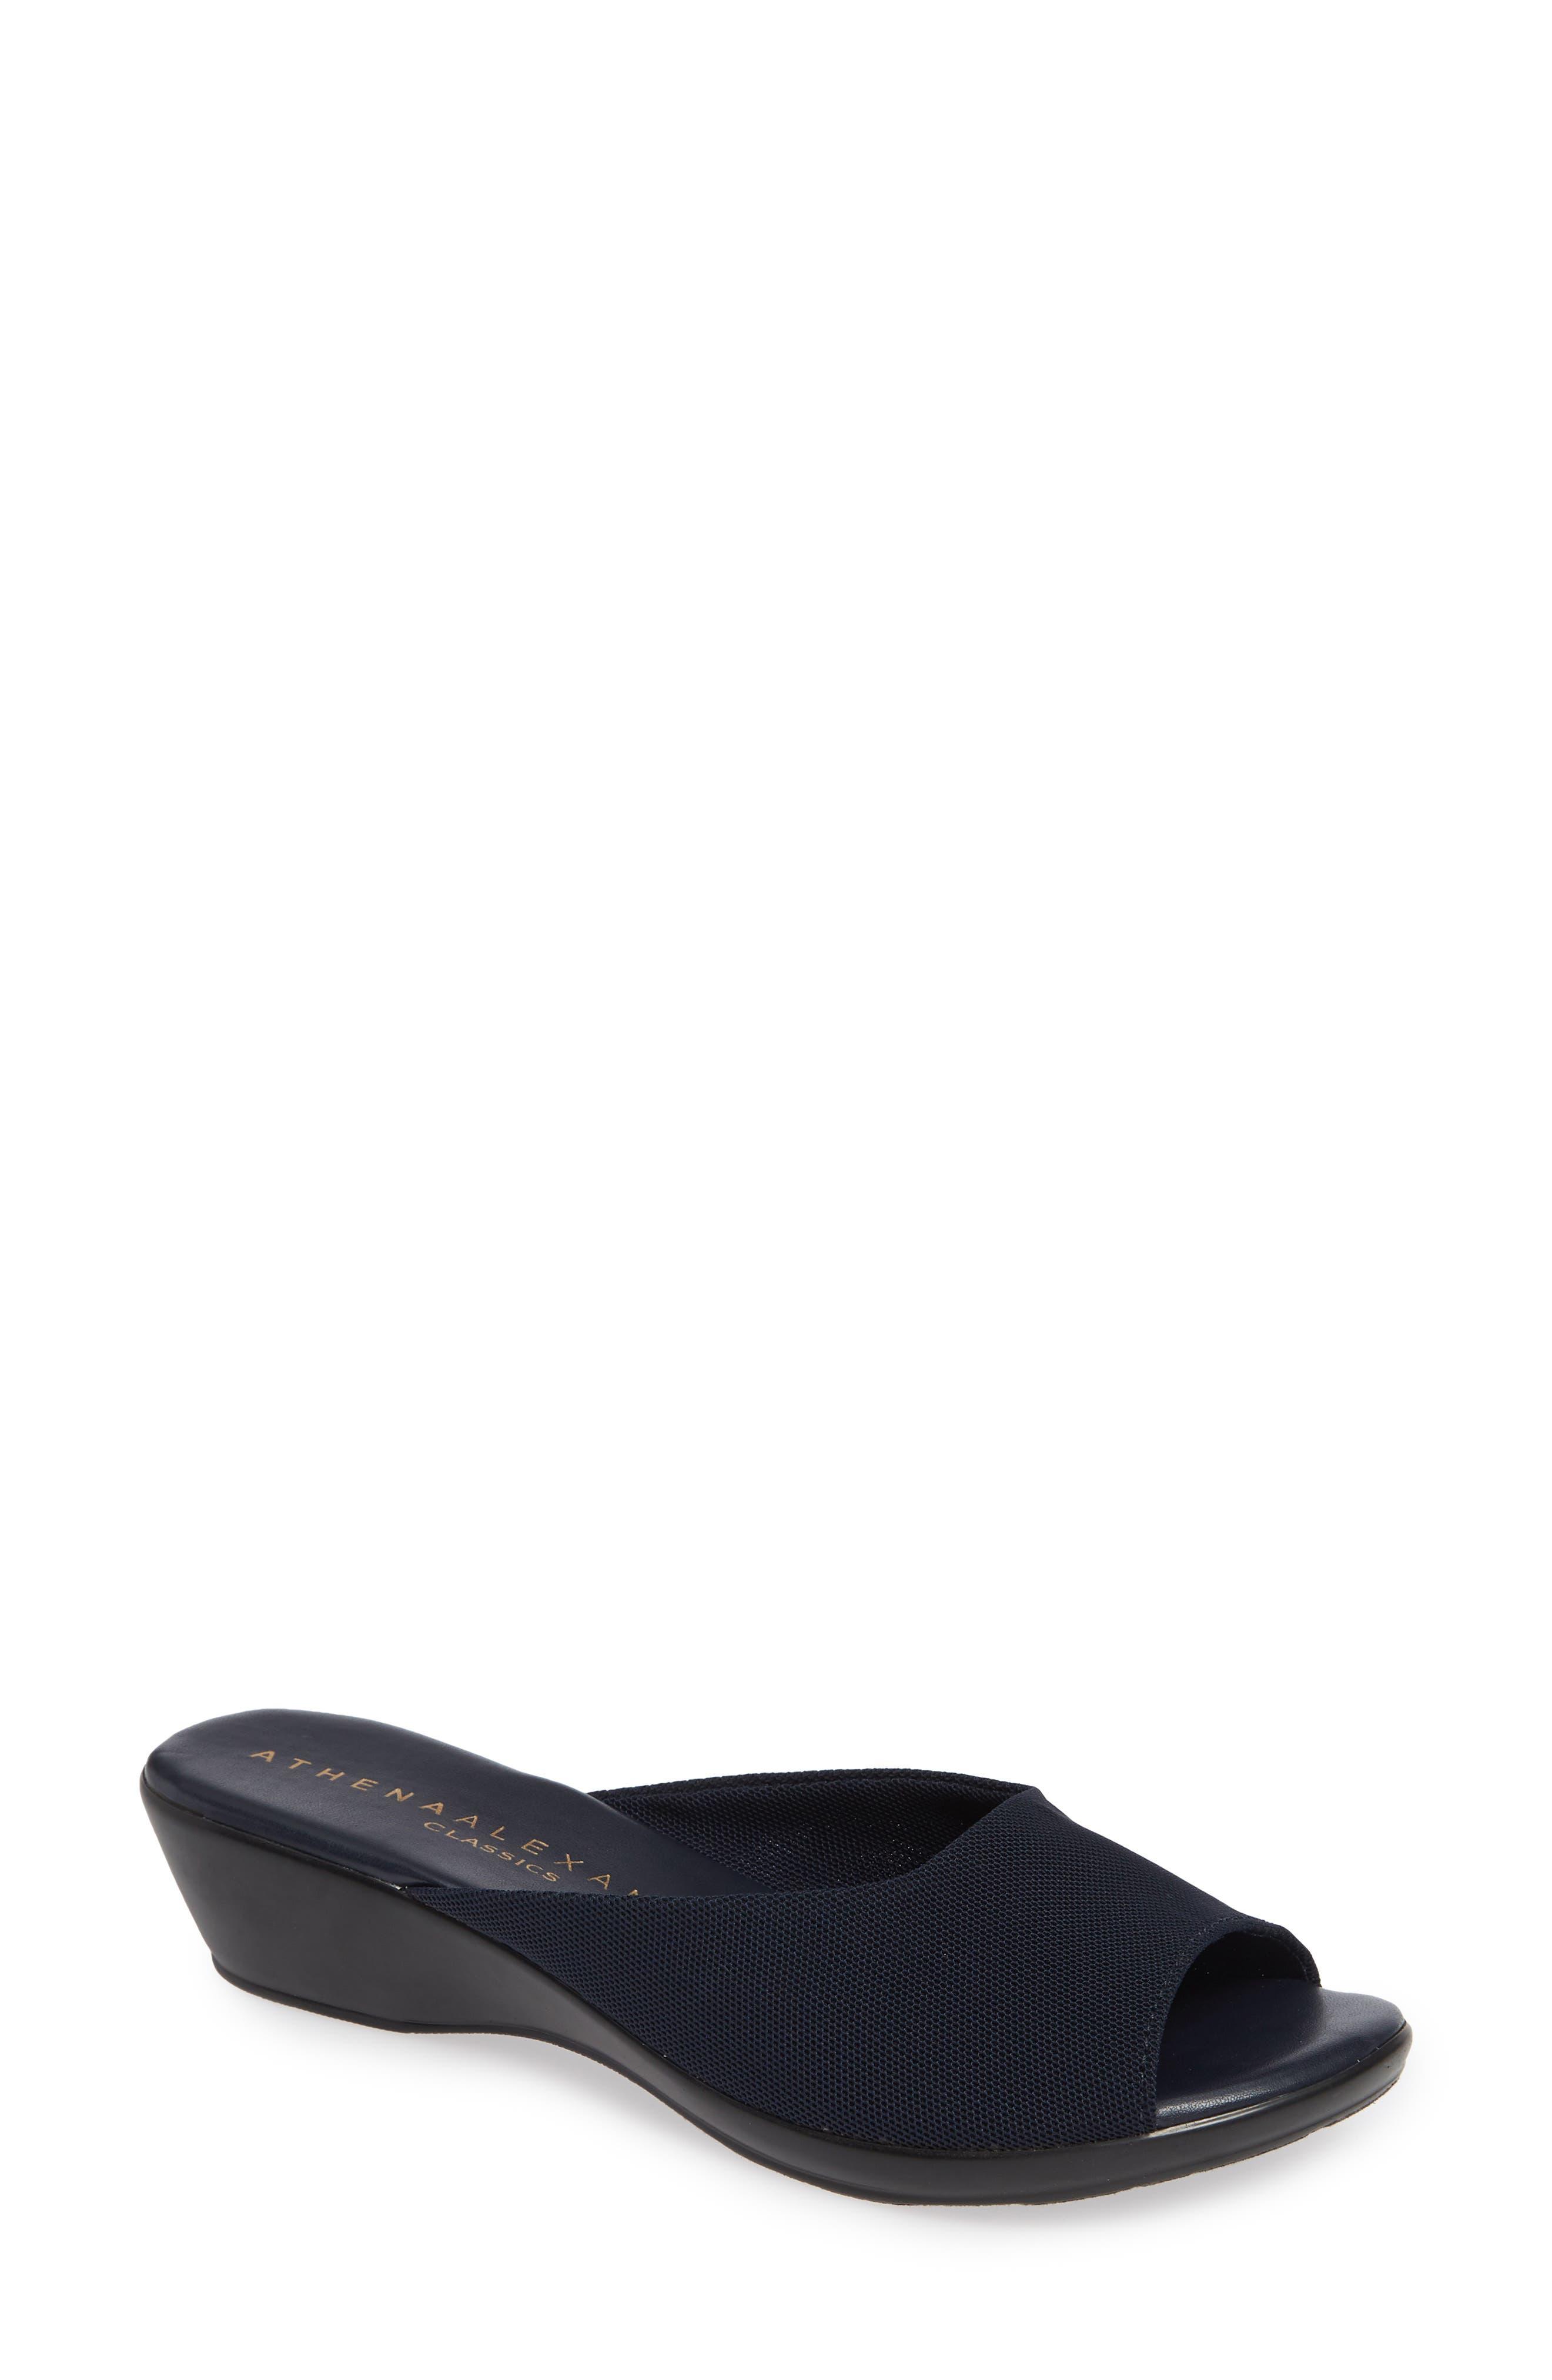 Athena Alexander Bambuca Wedge Slide Sandal, Blue